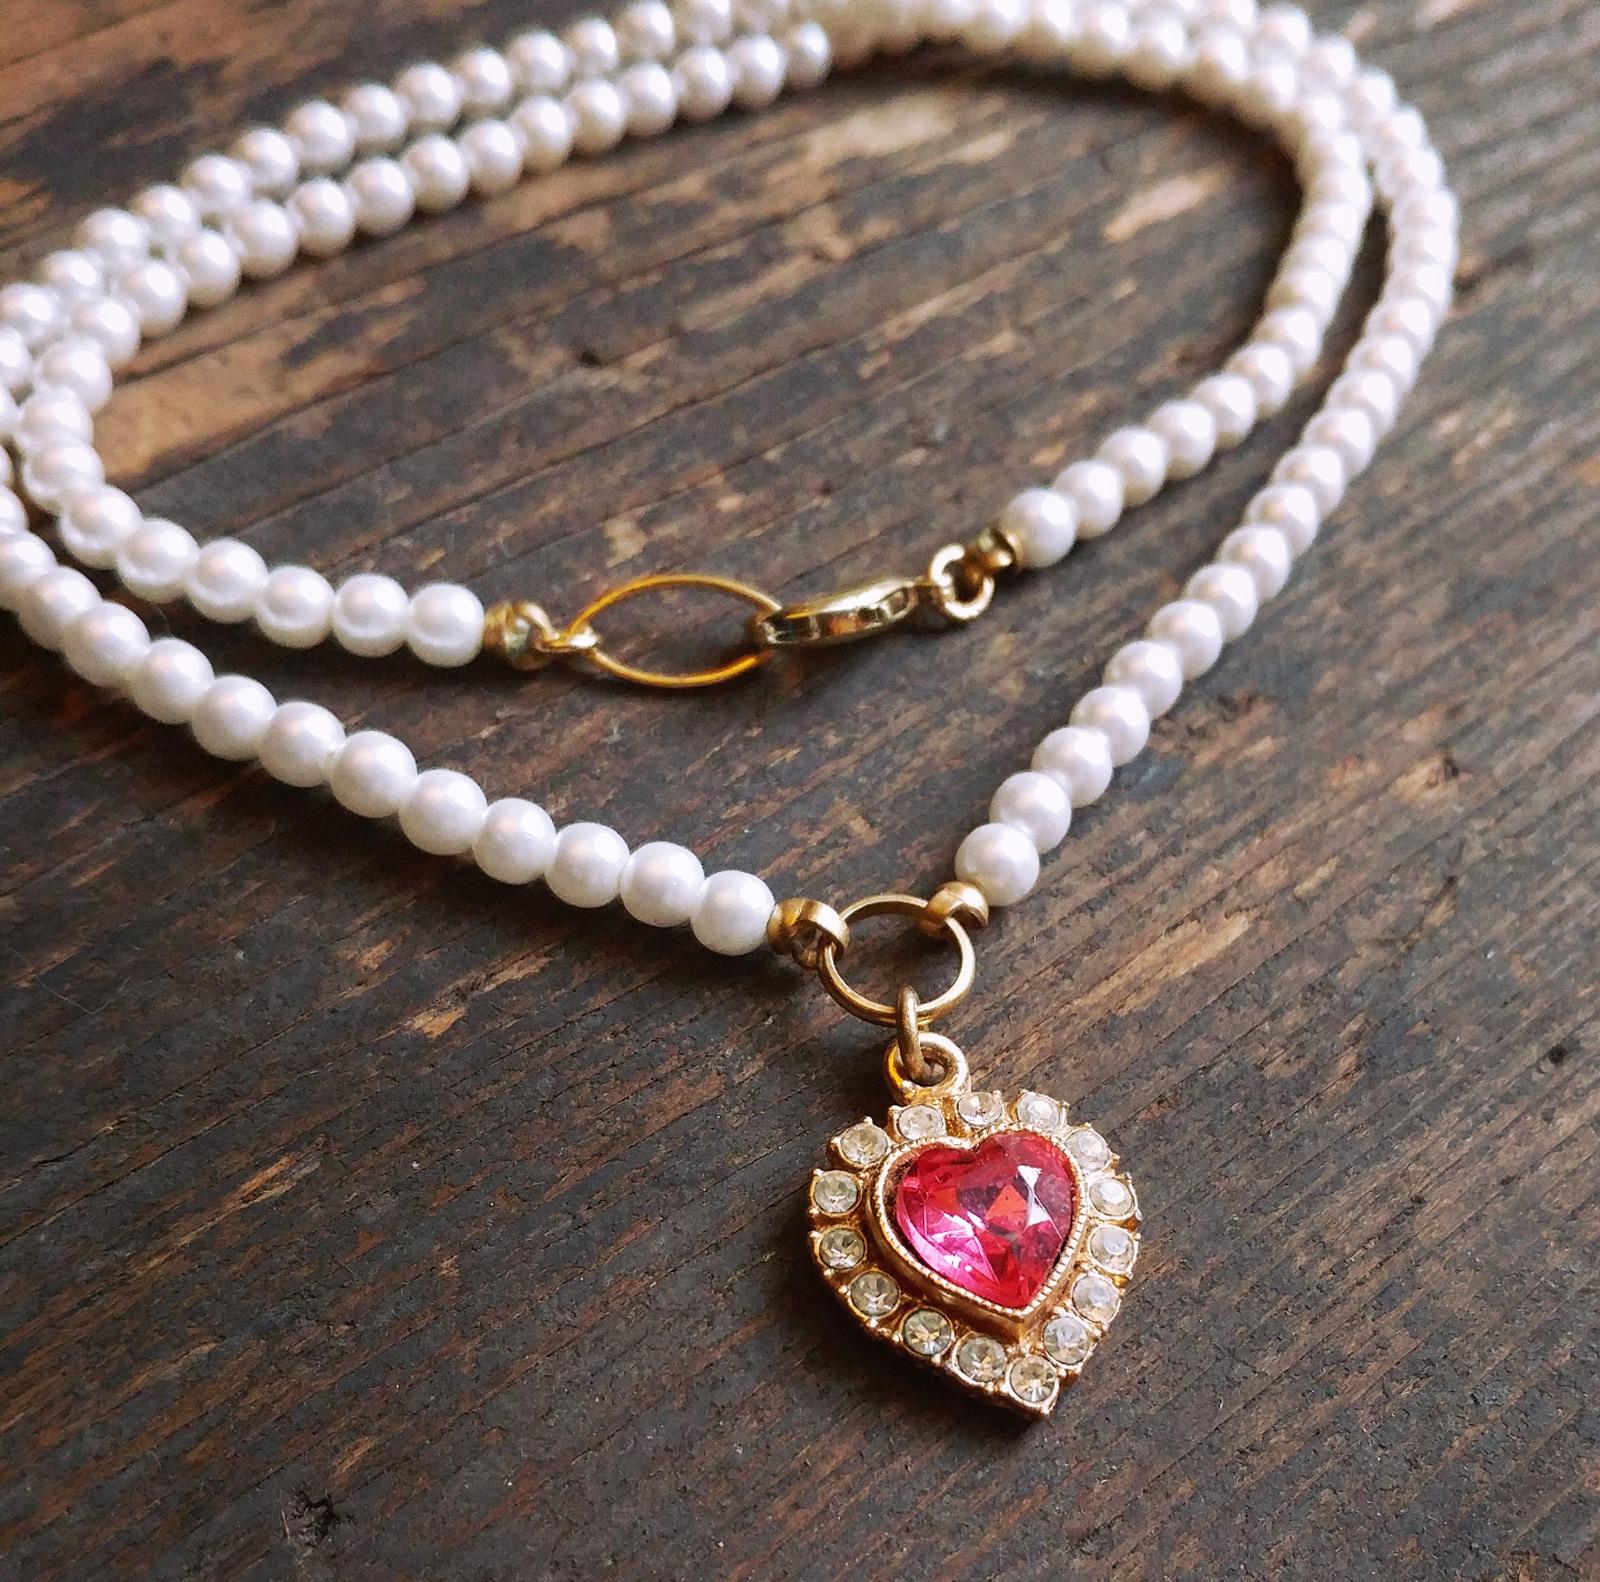 Perfect pink rhinestone heart pendant